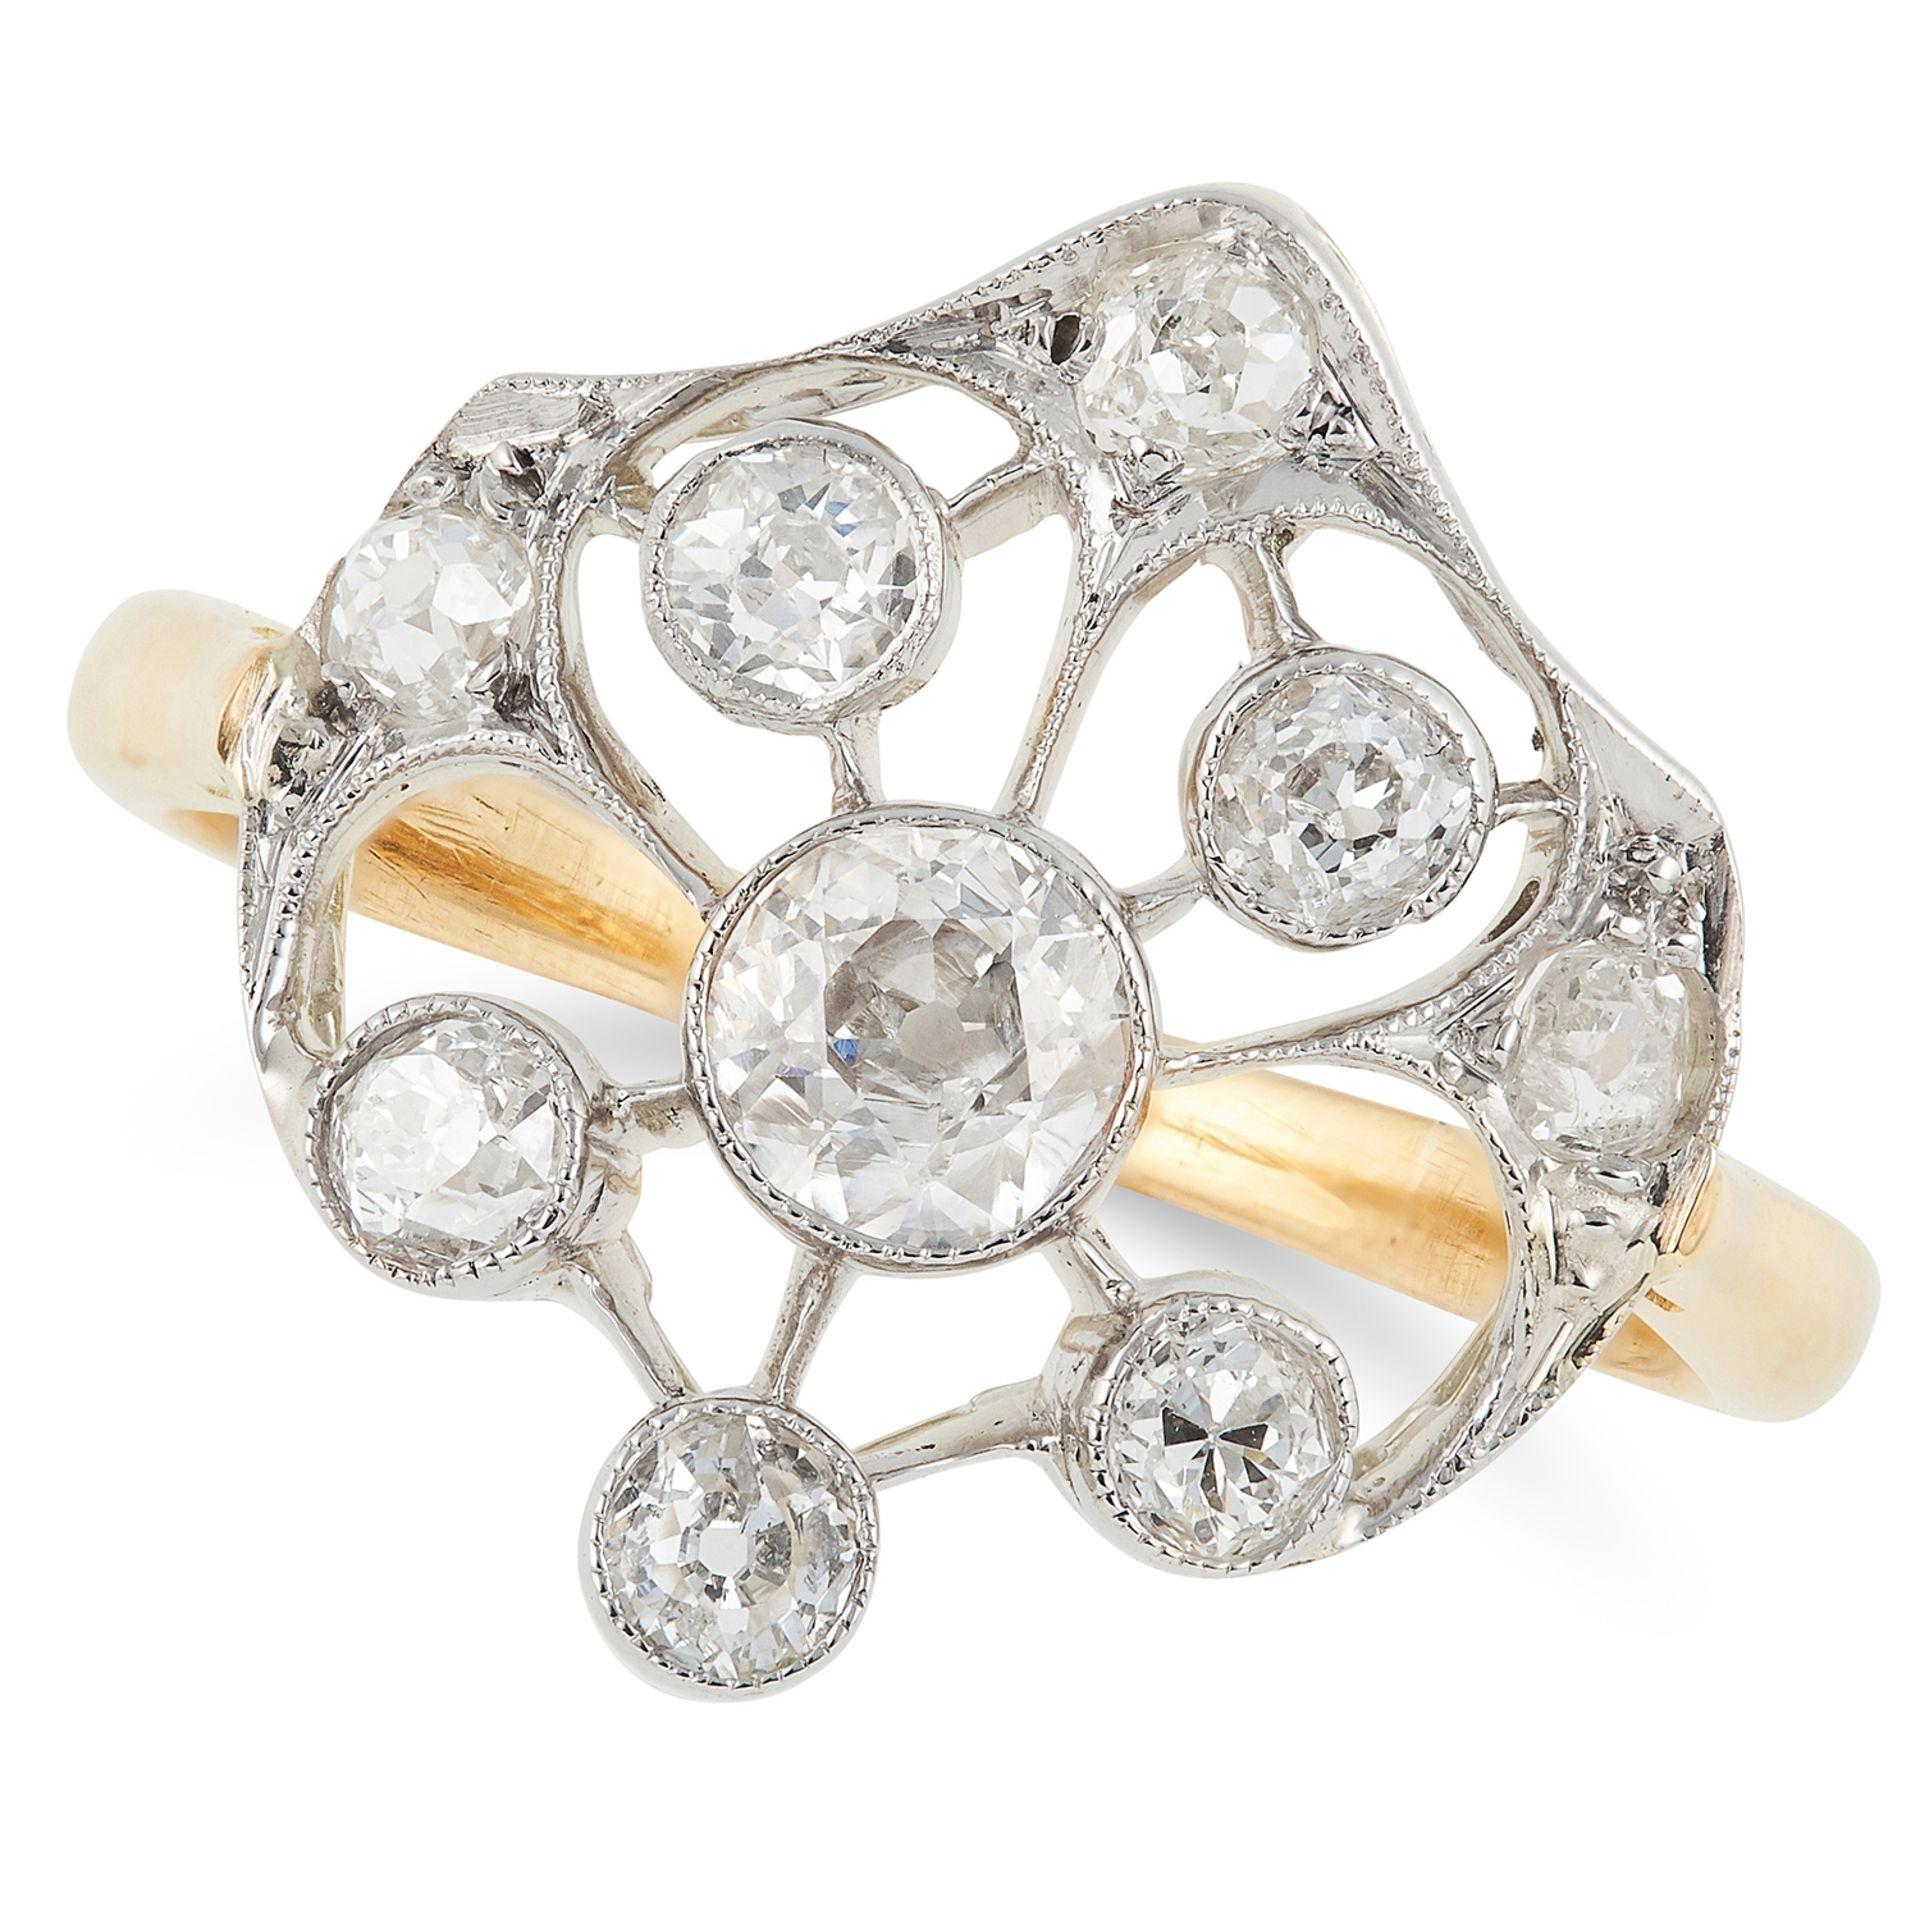 DIAMOND DRESS RING set with round cut diamonds, size K / 5, 3.1g.